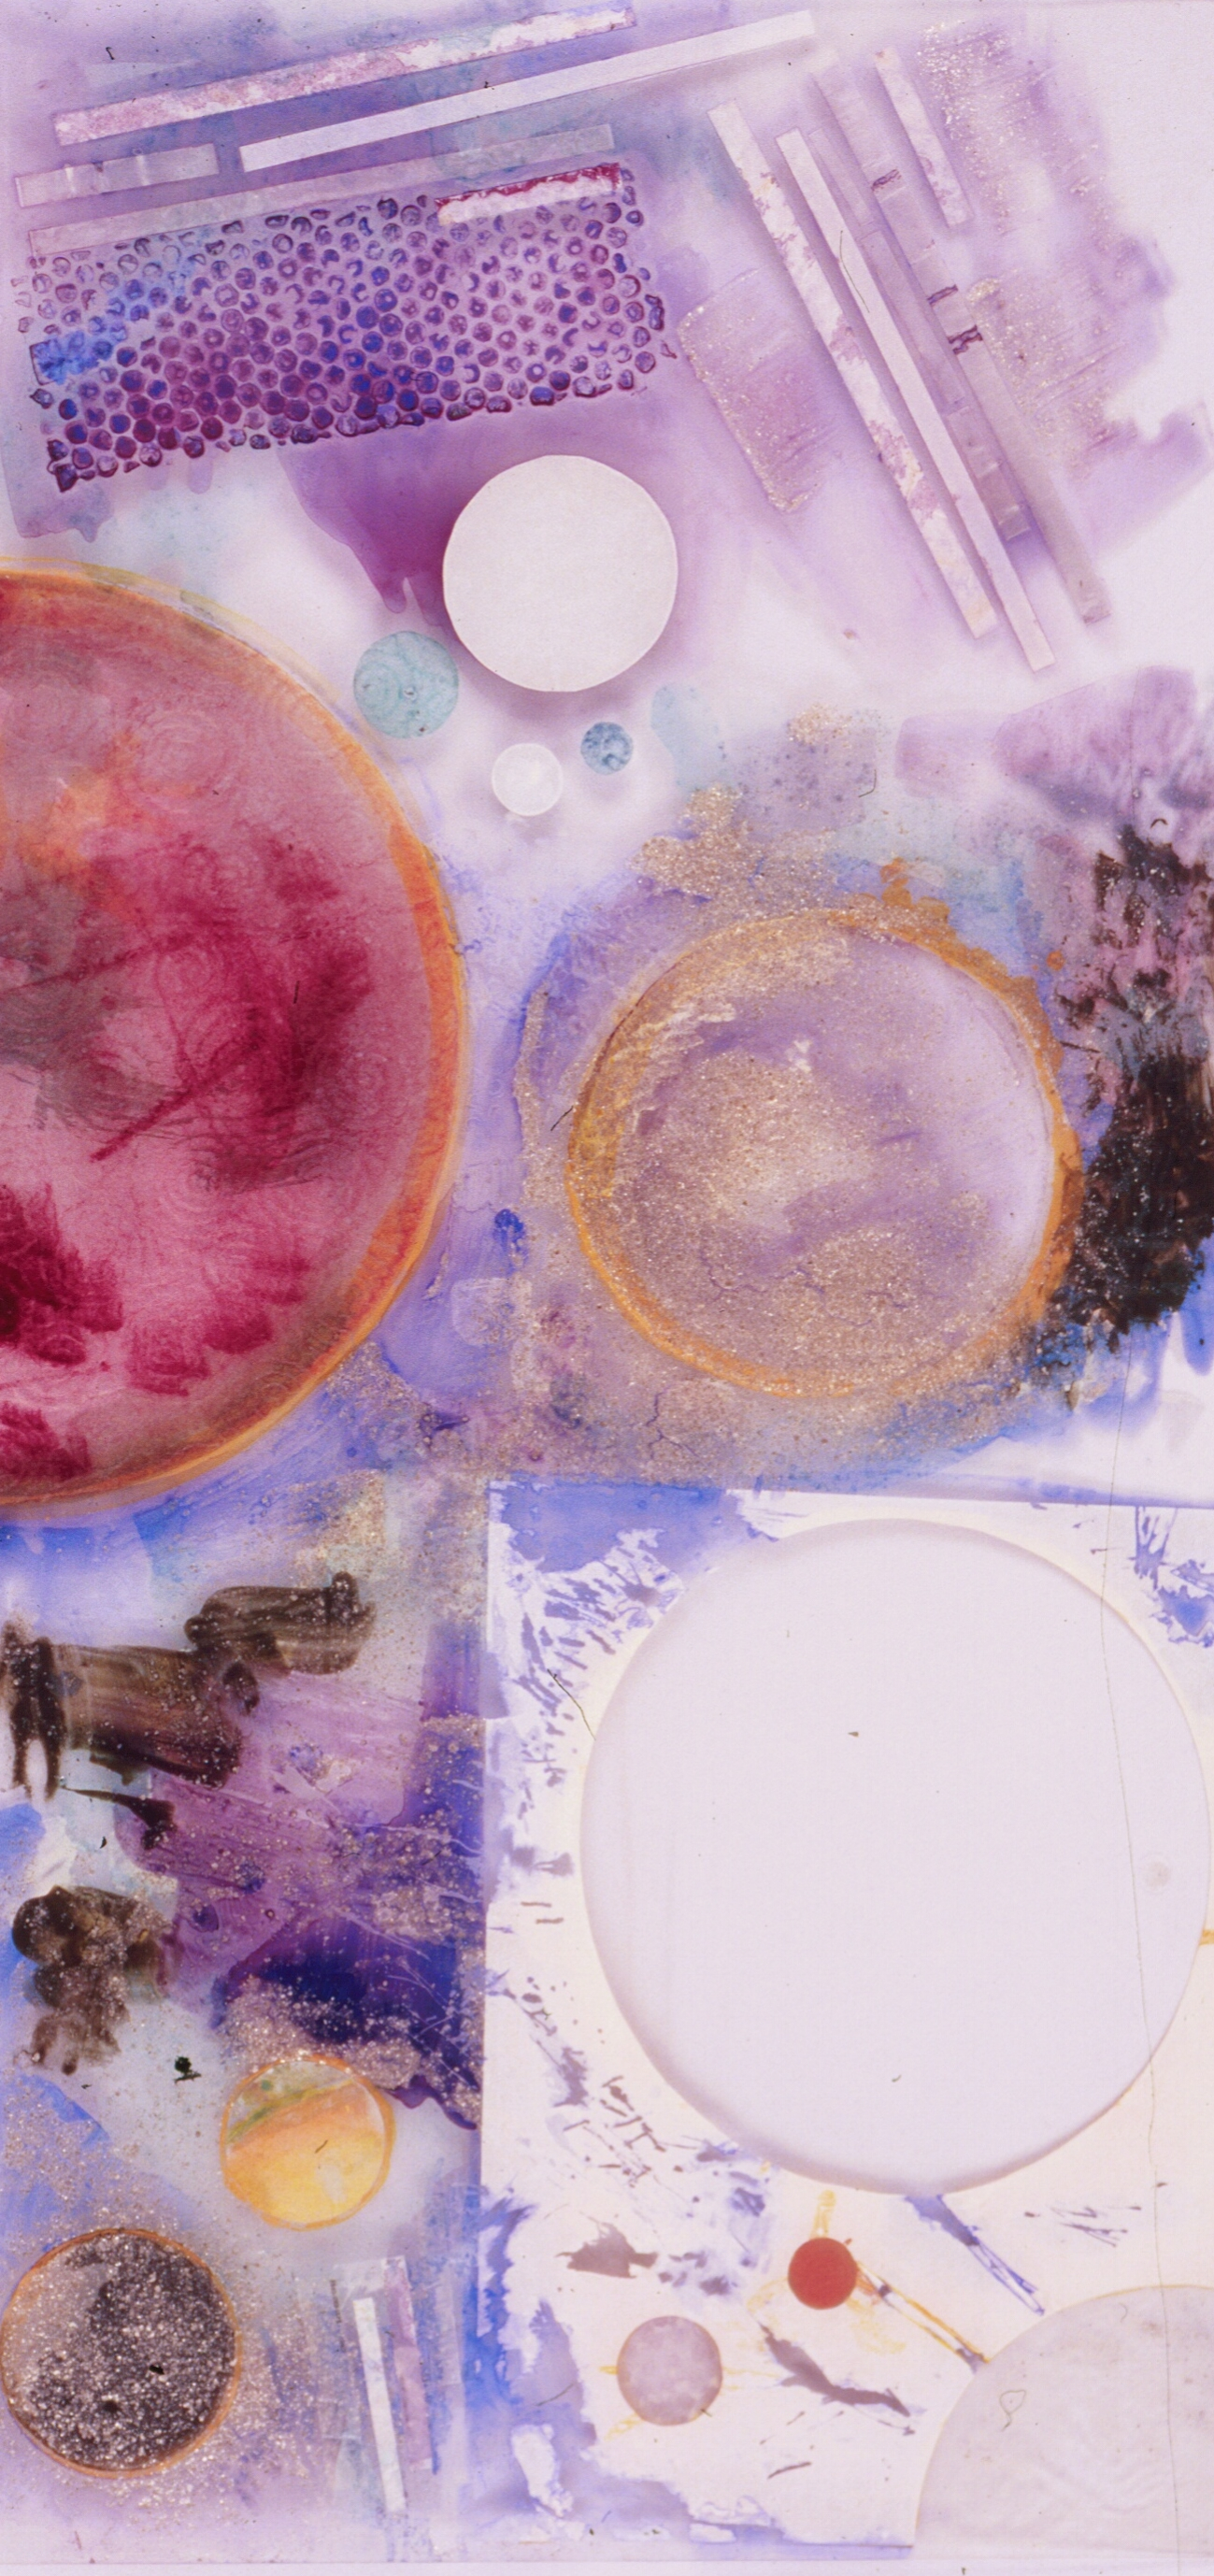 Ode to Popovov #4  A crylic on Plexiglass, Hinged Mahogany Panels, set of 4  size